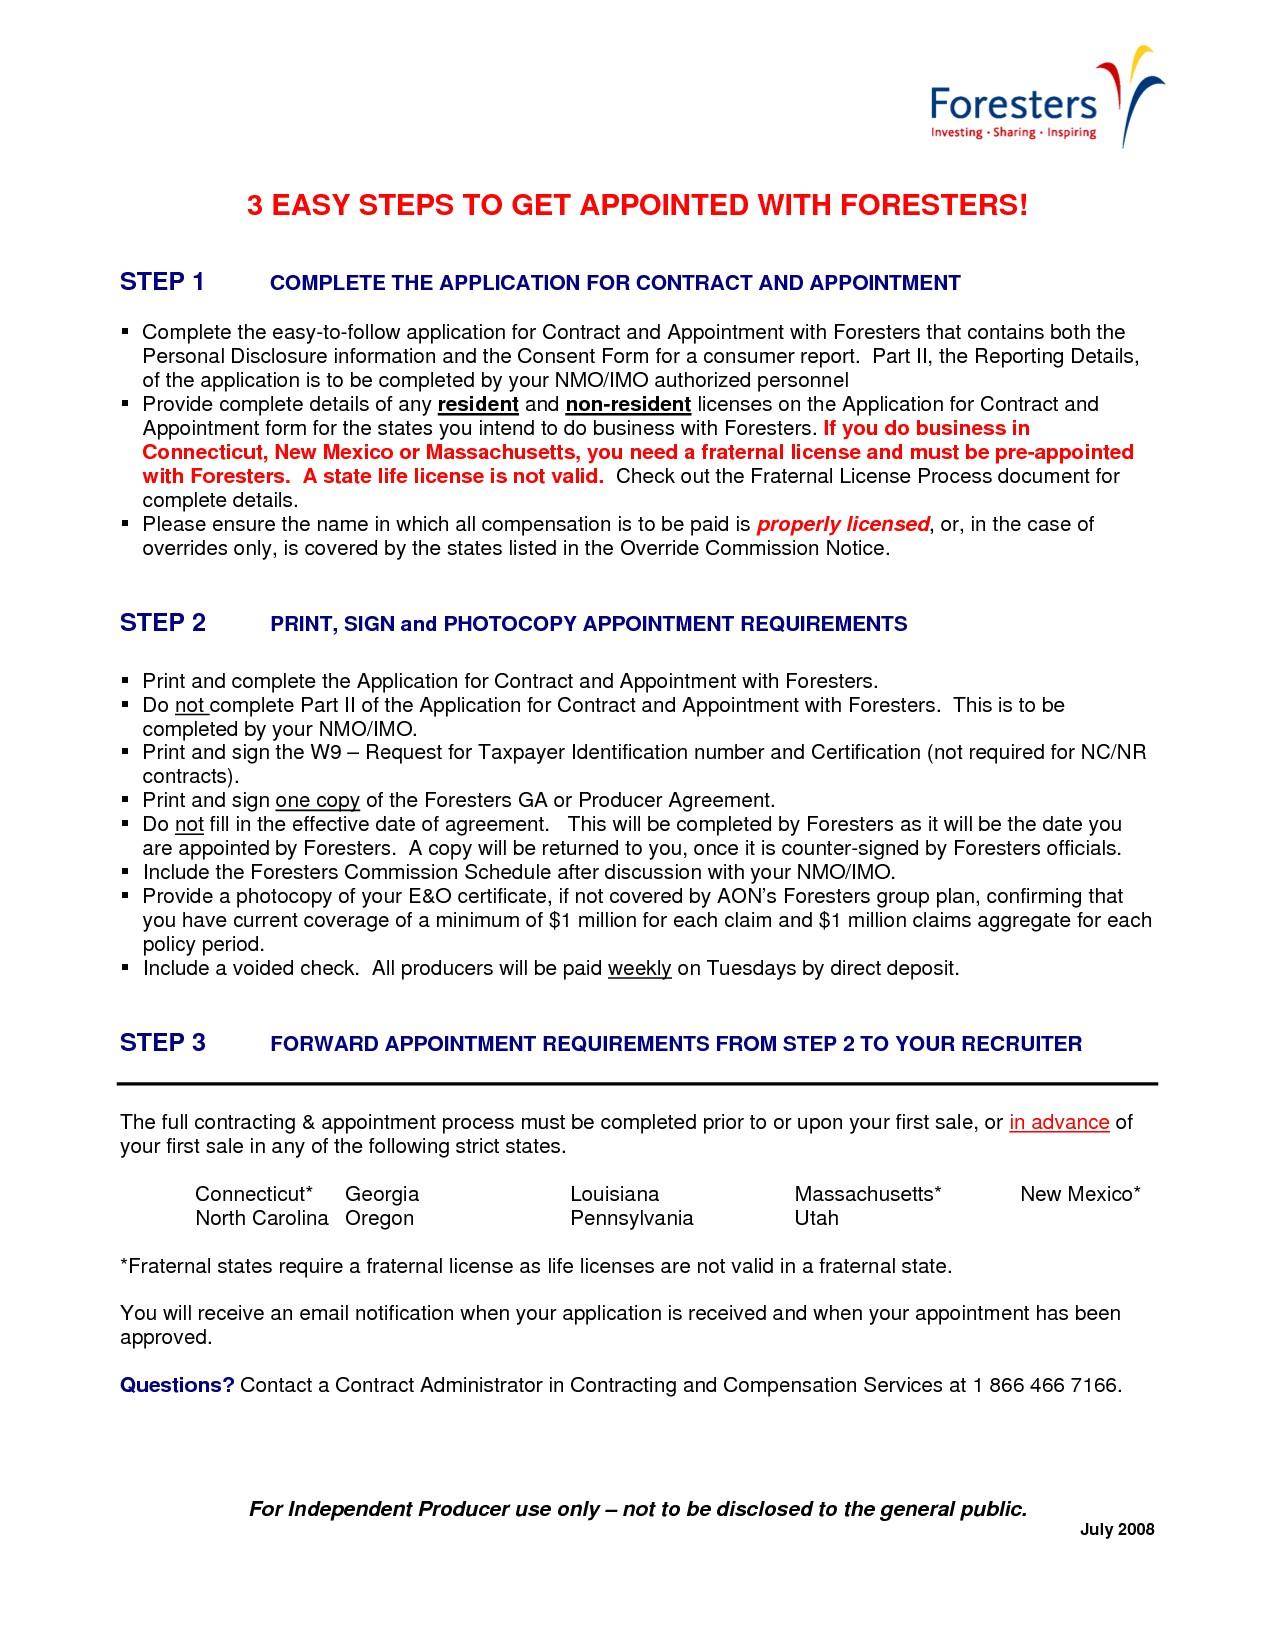 Insurance Business Plan Template Insurance Agency Business Plan Template Best Business